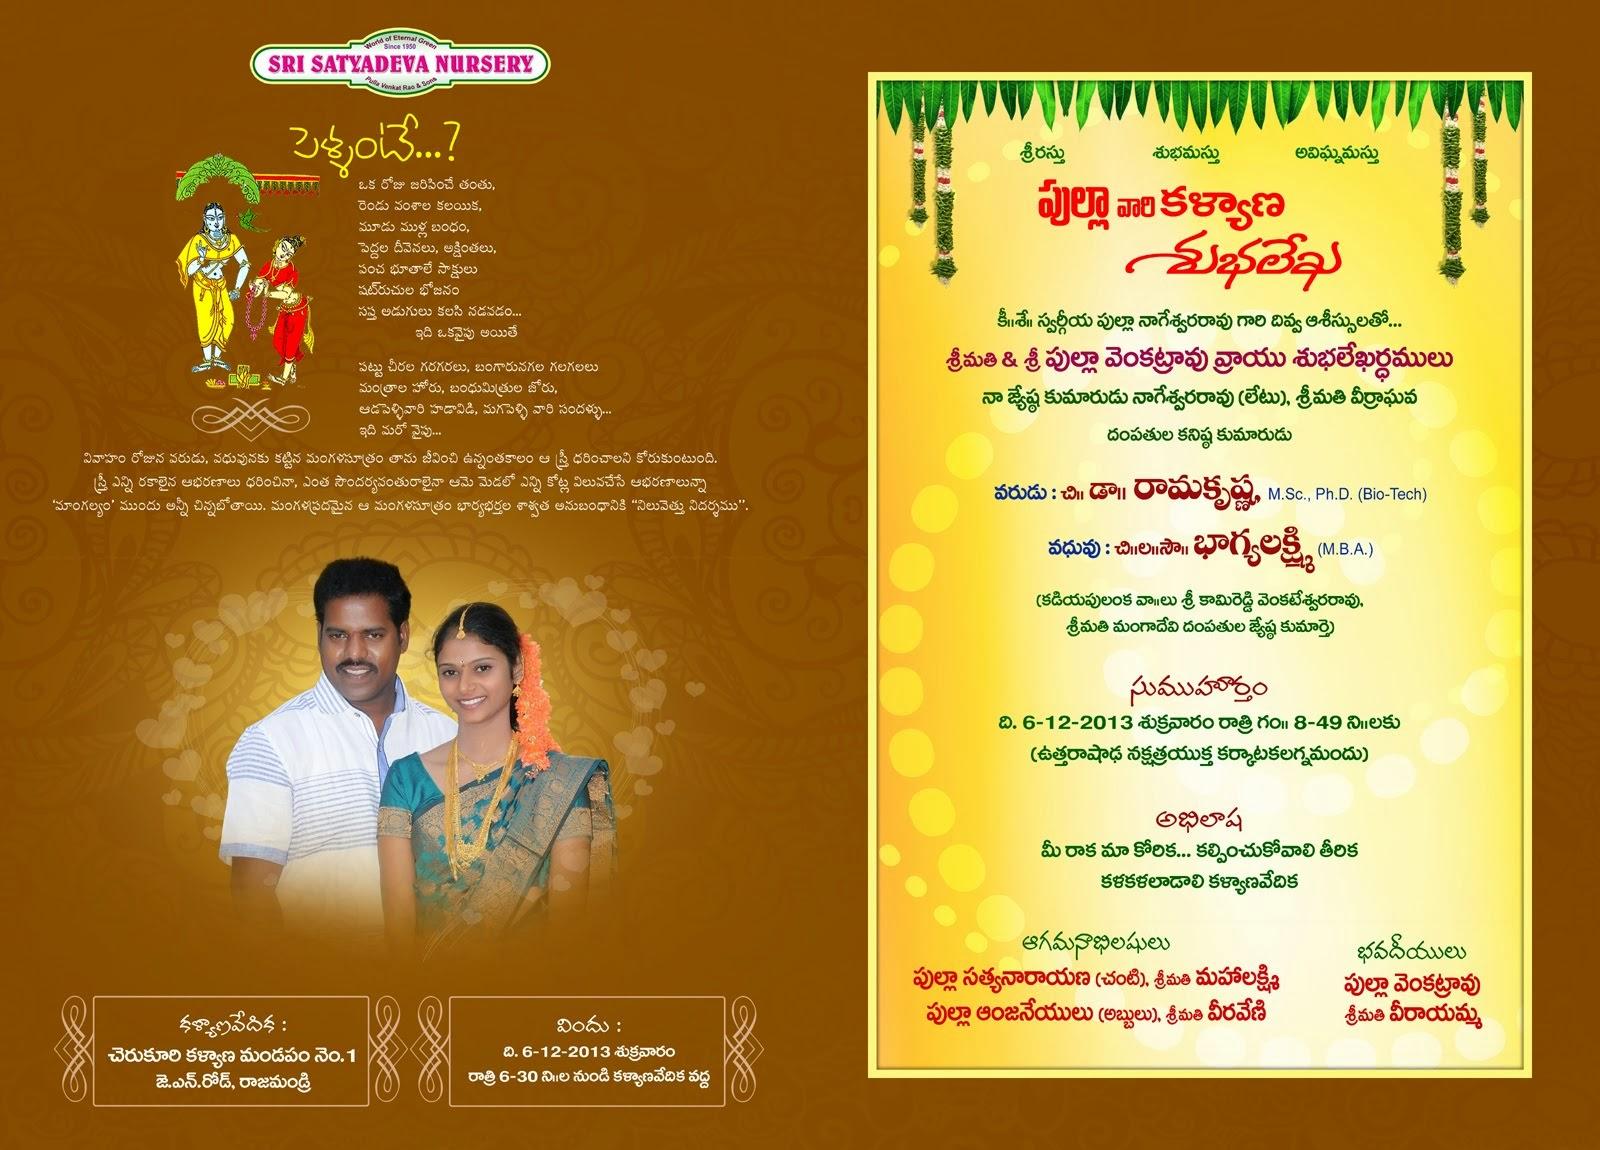 Marriage invitation cards in telugu matik for nurserymen association kadiyam nurseries wedding invitation marriage invitation cards in telugu stopboris Images